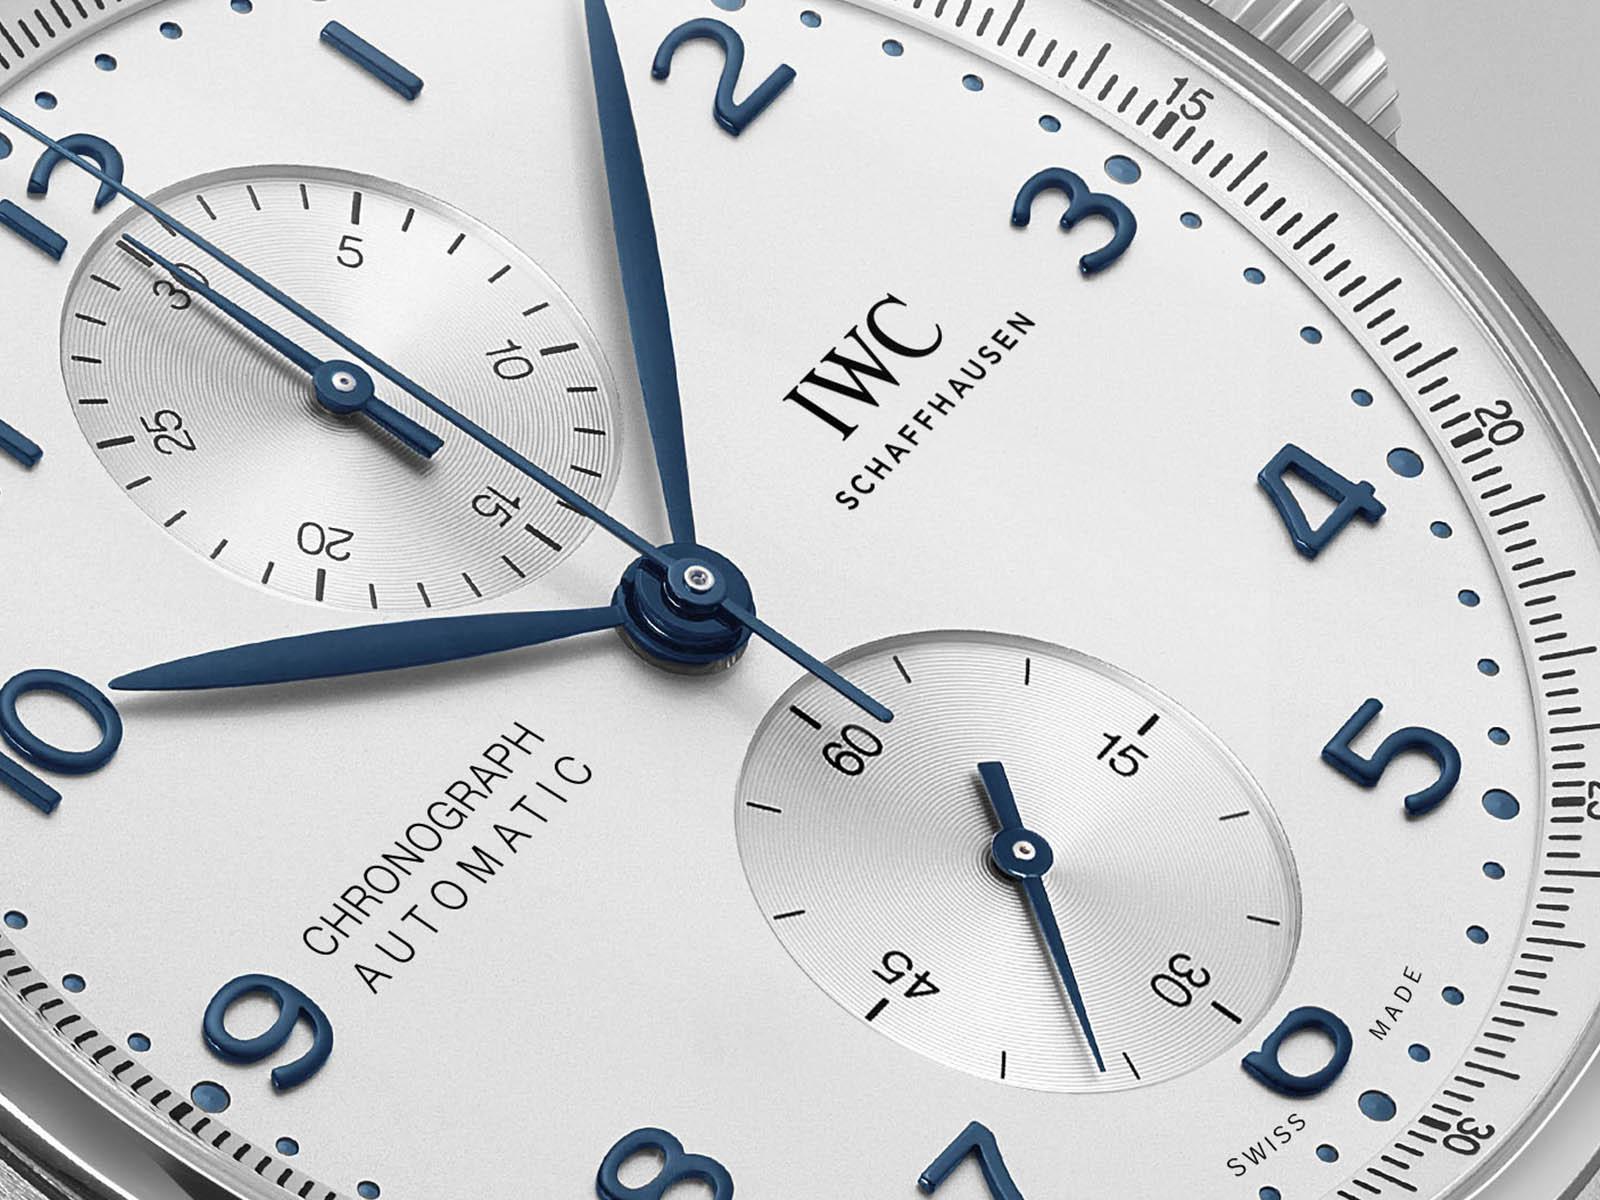 iw371617-iwc-portugieser-chronograph-stainless-steel-bracelet-4.jpg